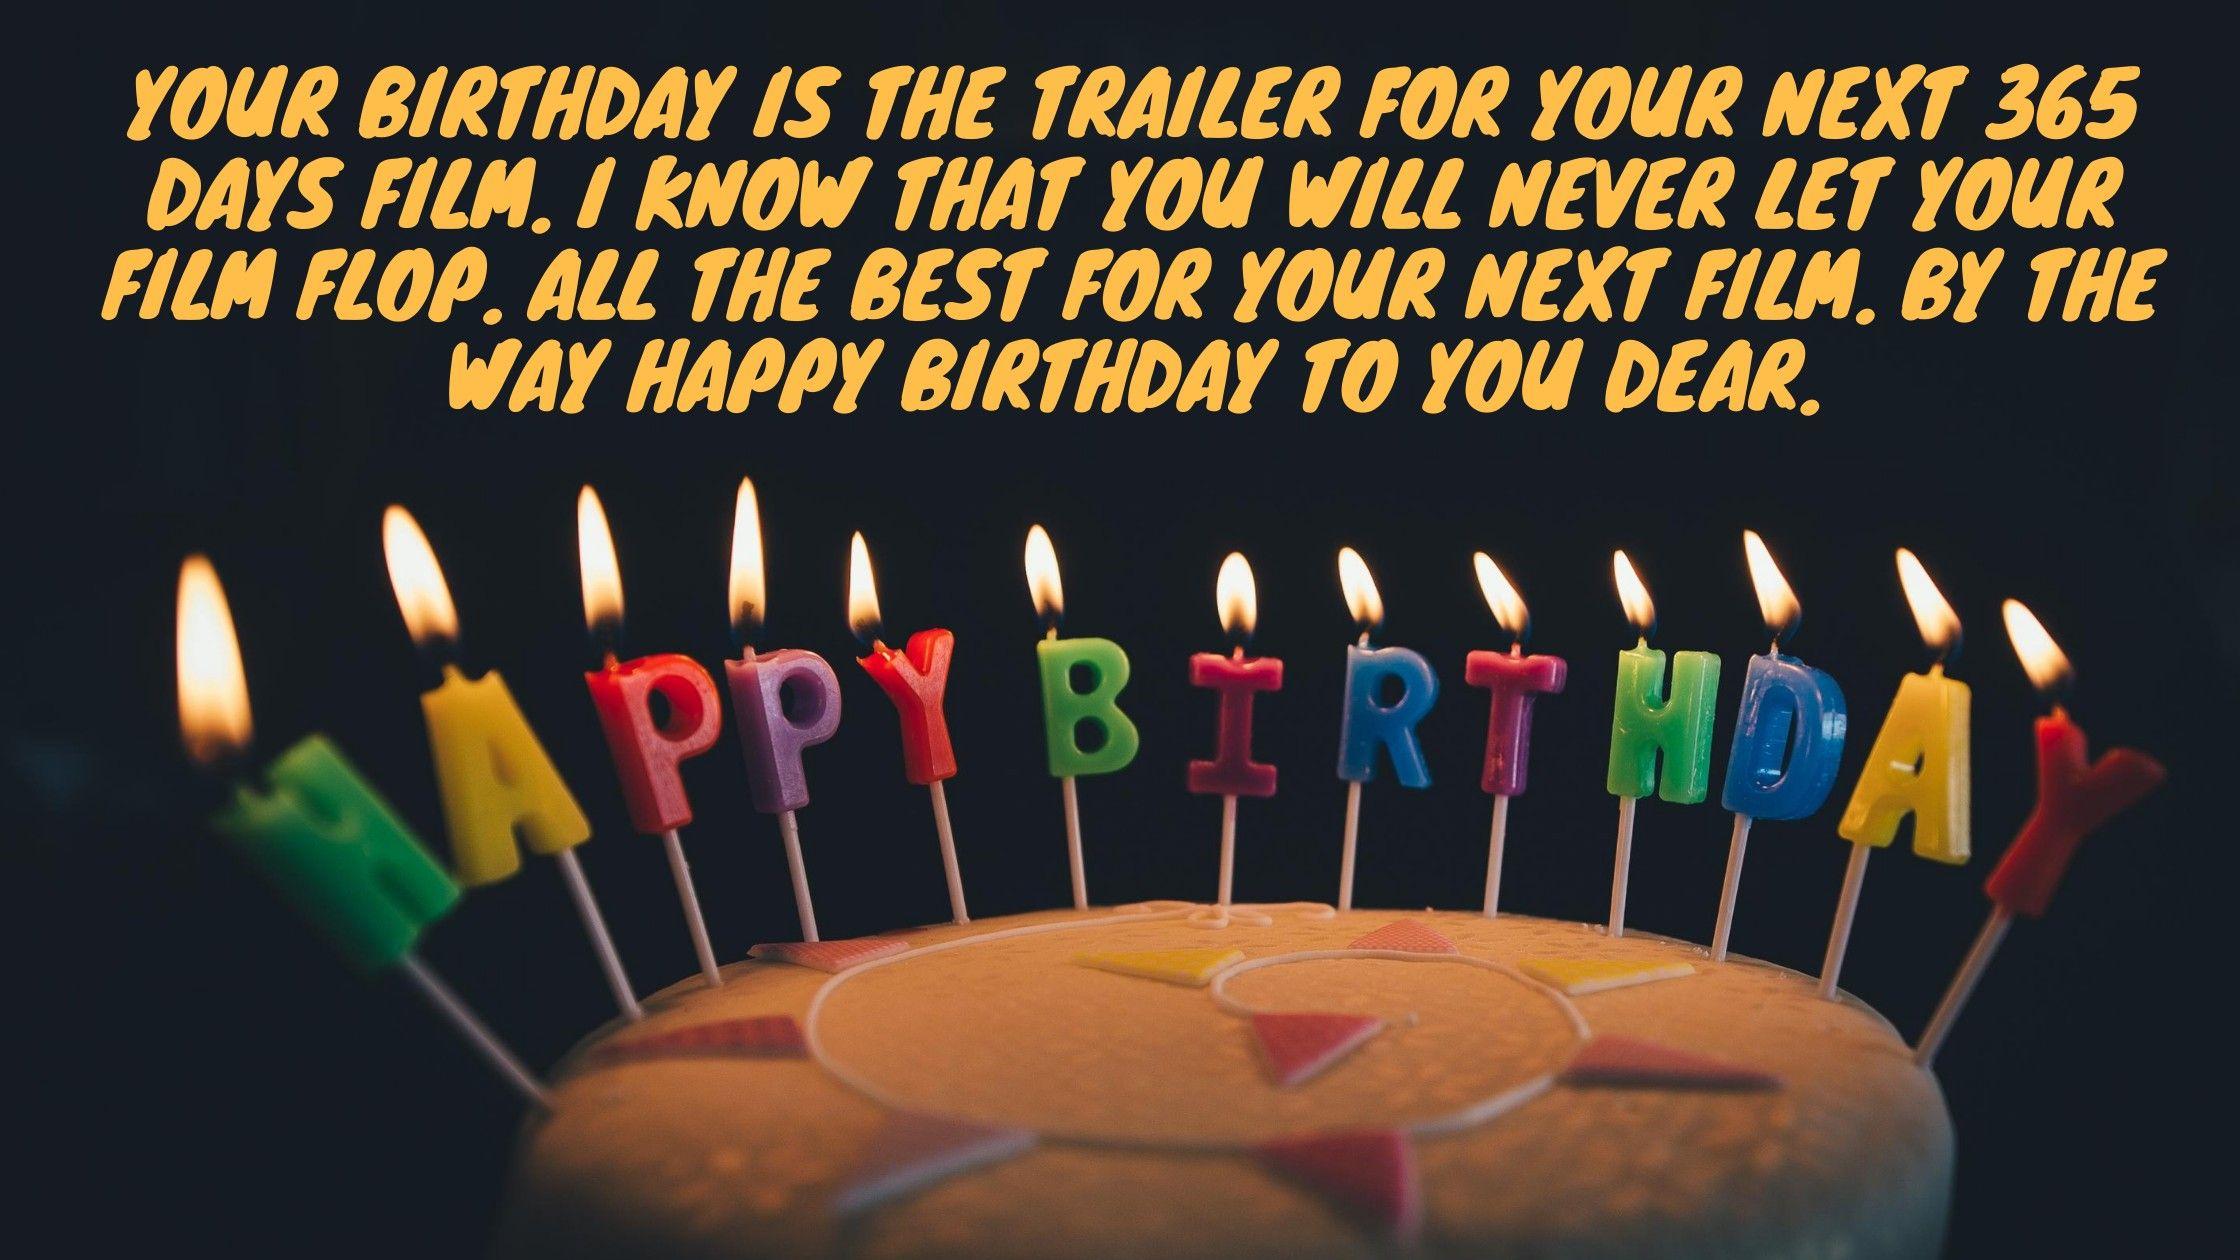 Happy Birthday Status Best Bday Status In 2020 Happy Birthday Status Happy Birthday Fun Bday Status